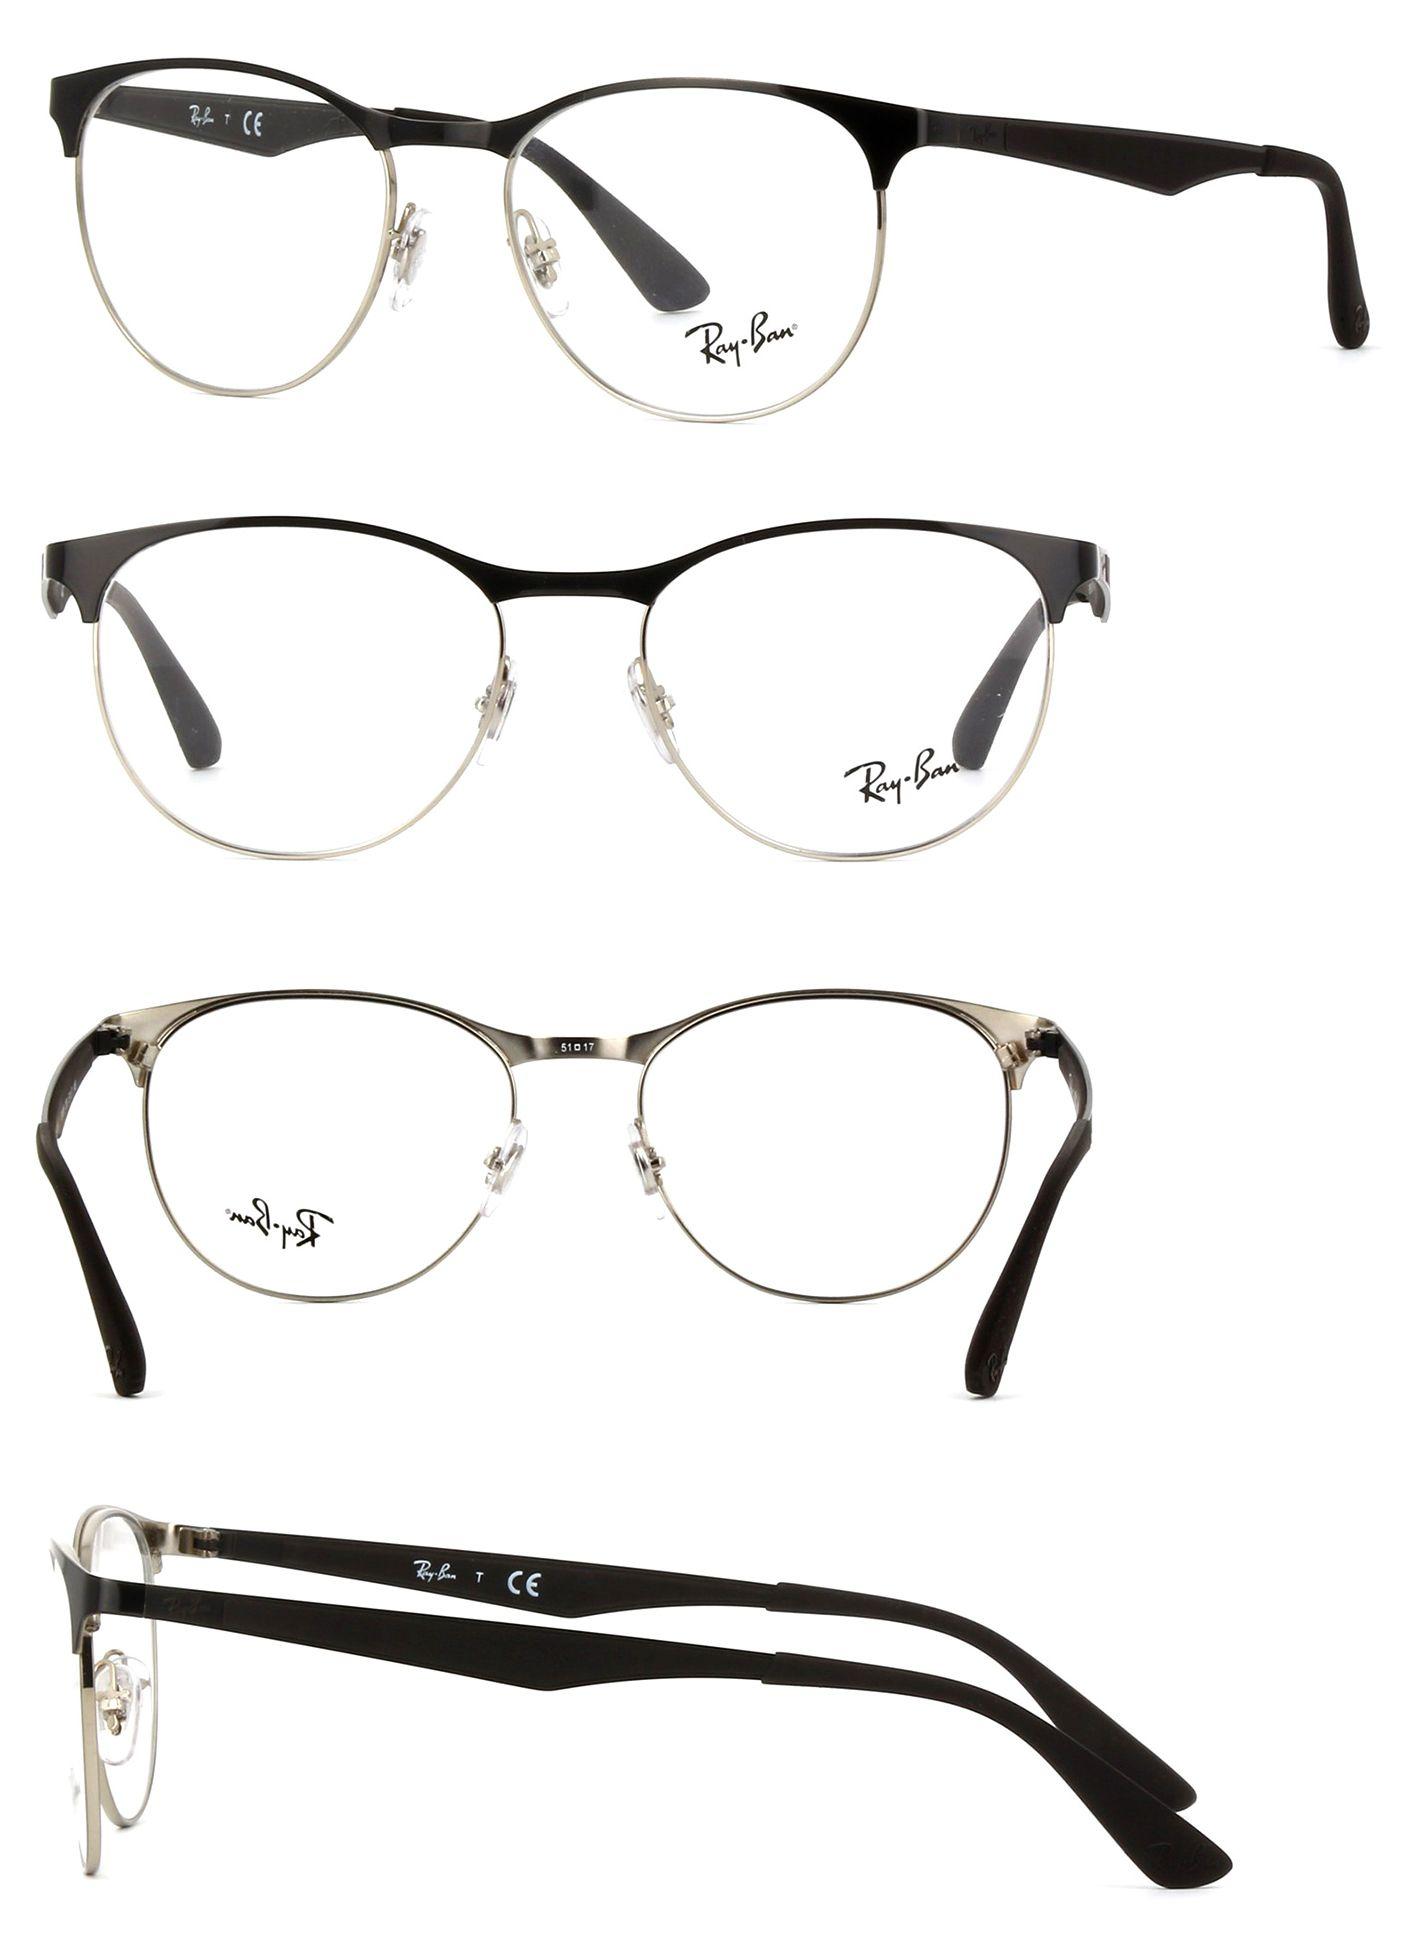 1416x1945 sunglasses dressesampshoes,bags ray ban sunglasses, ray bans